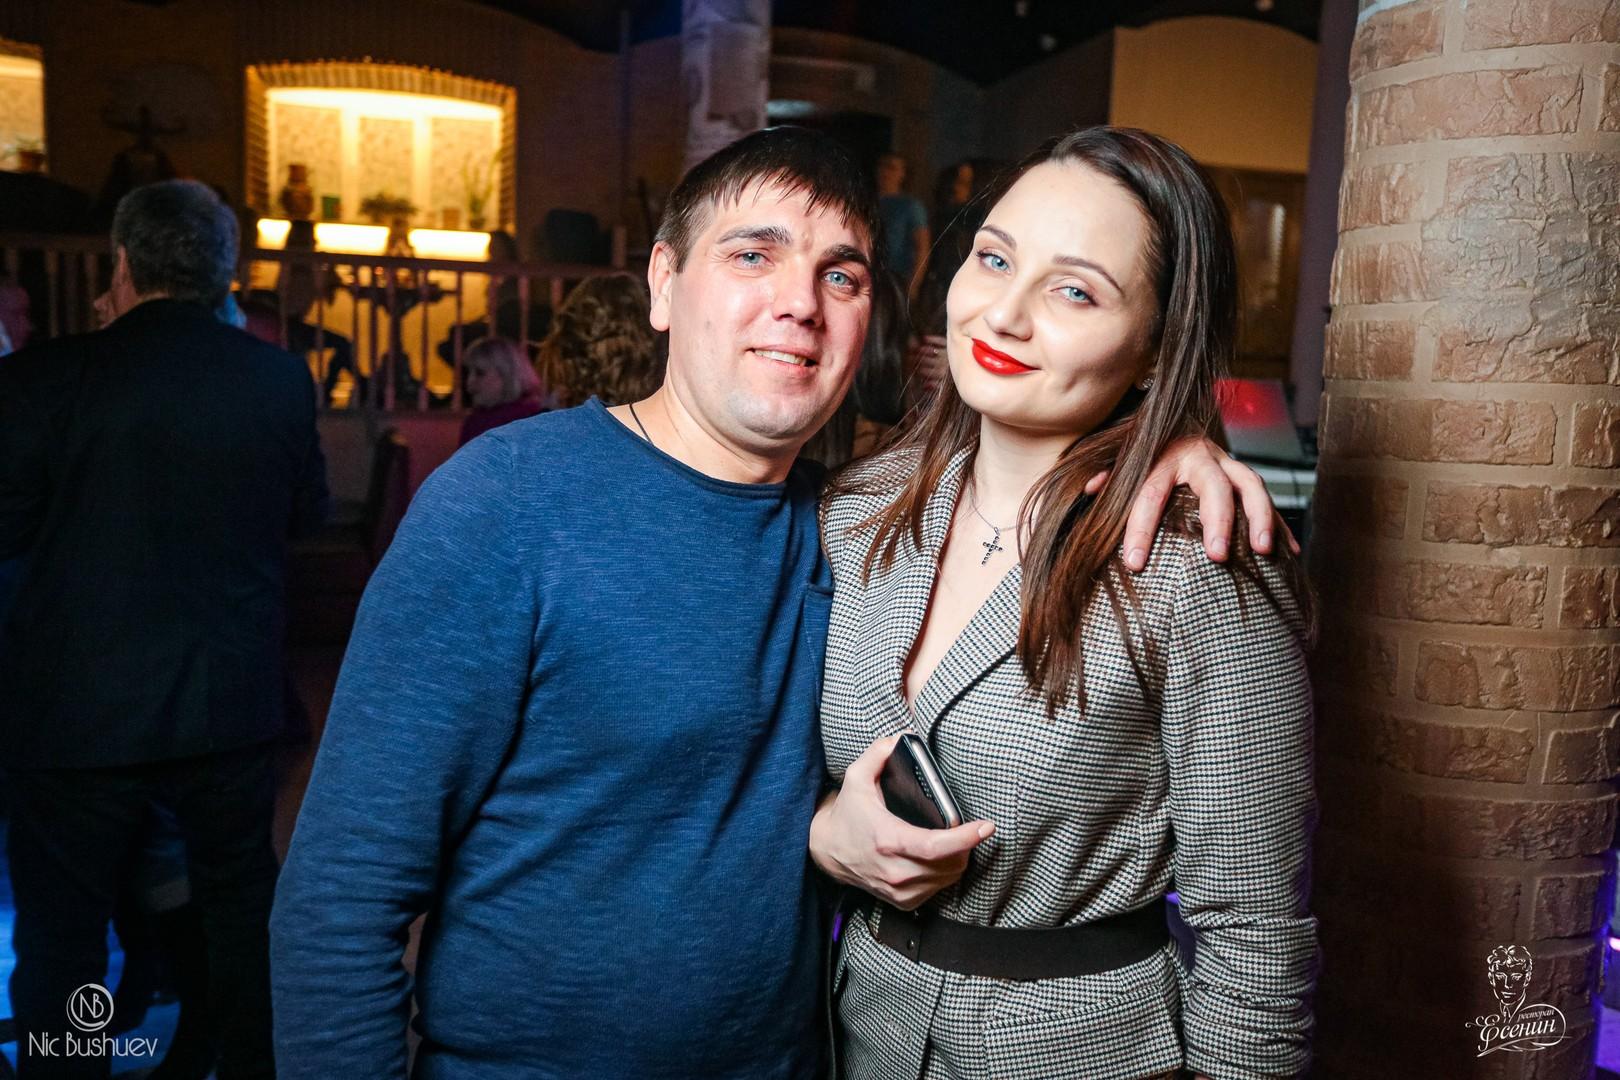 Ресторан Орехово-Зуево Есенин 14_02_2020 (8)